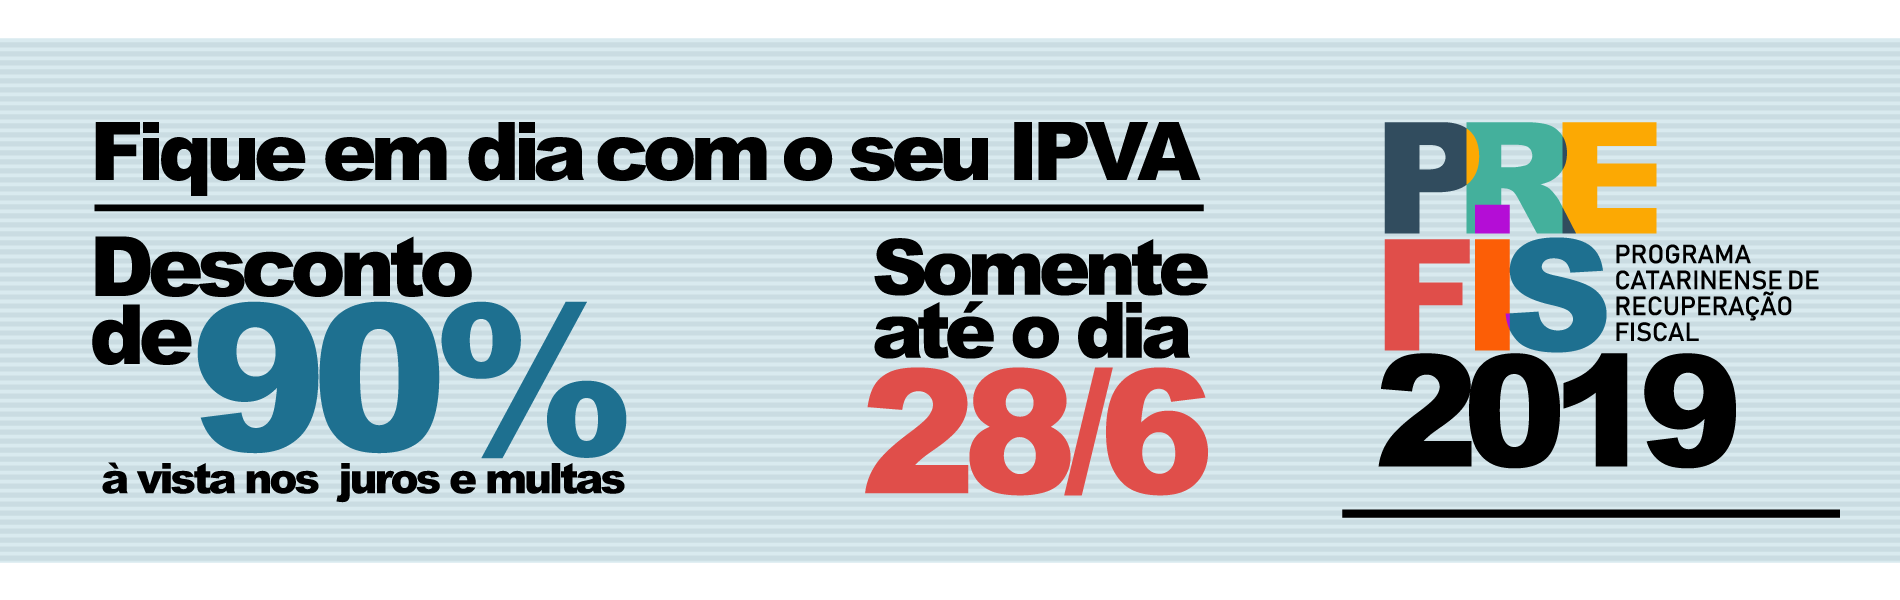 prefis_BANNER_DETRAN_IPVA_1900x600px